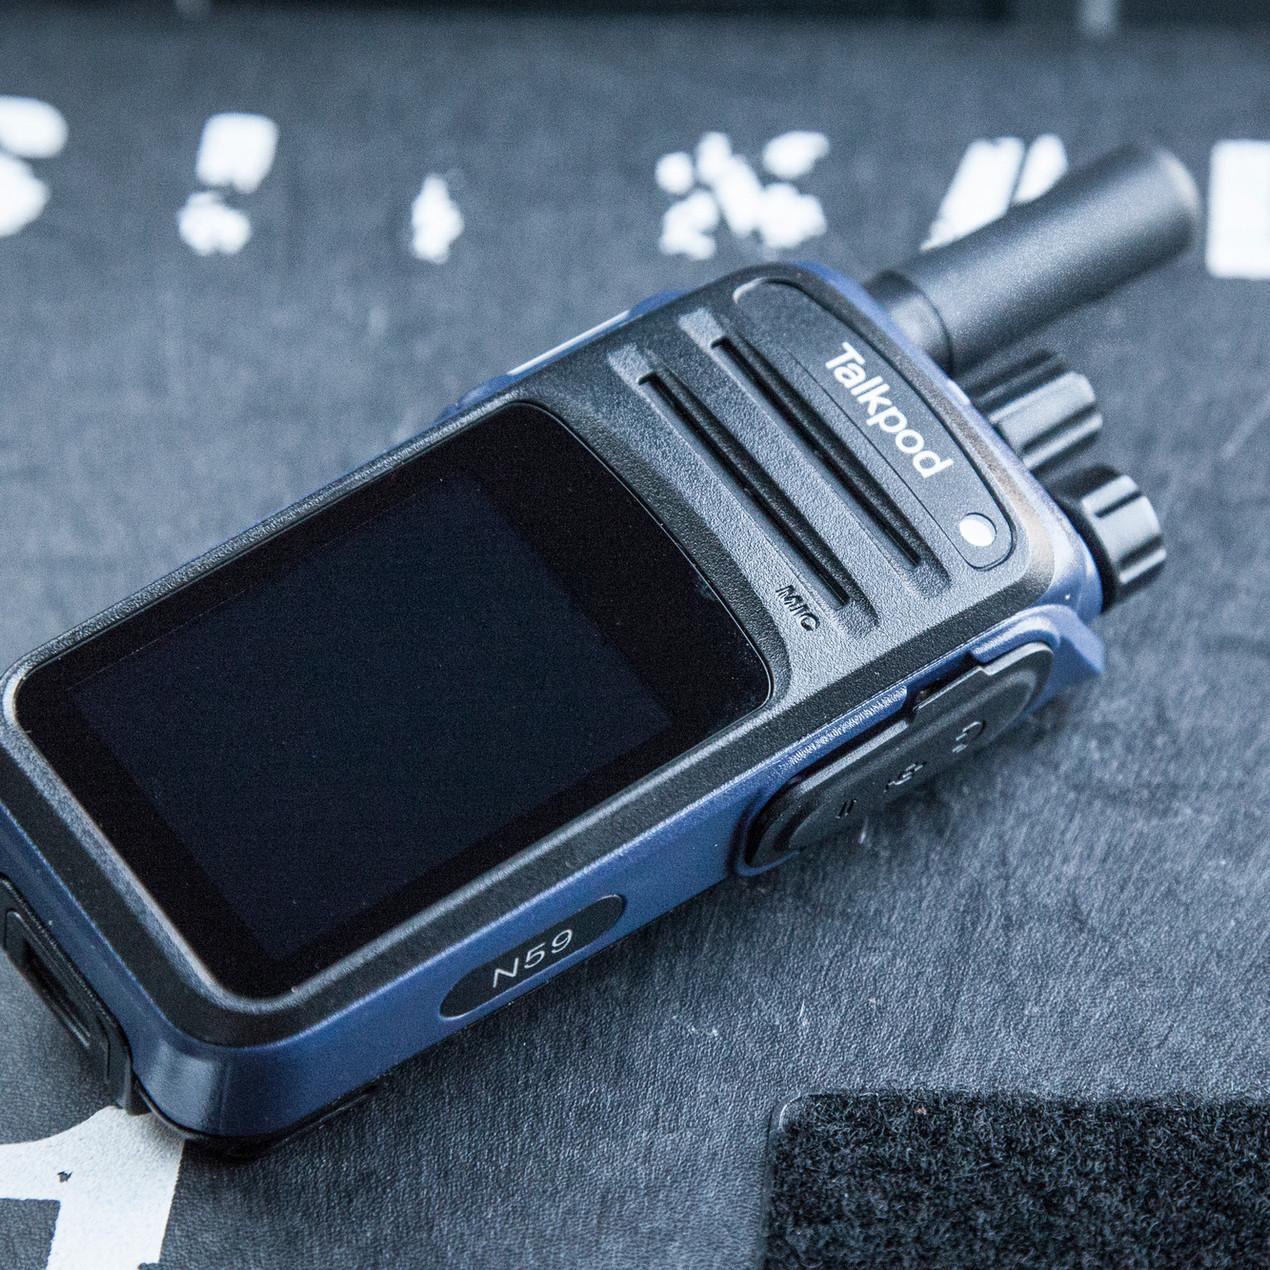 Talkpod N59 Network POC radio Blackline Simulations tactical zello accessories airsoft milsim IP54